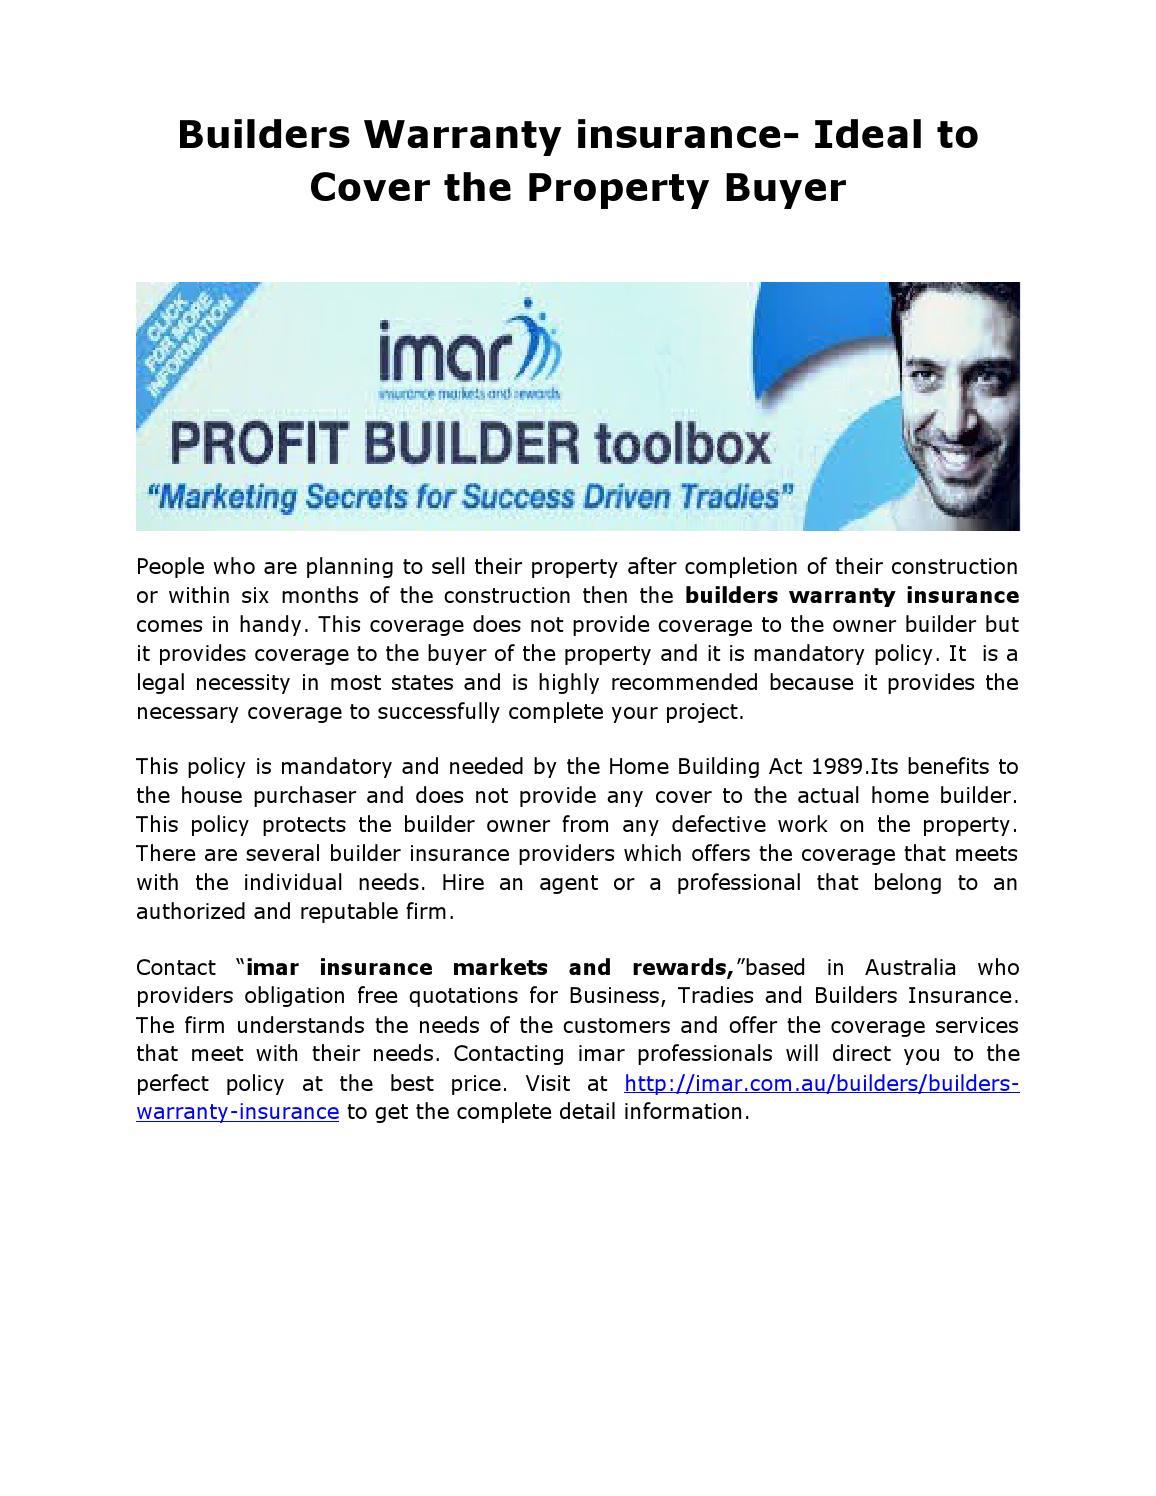 Builders Warranty Insurance By Imaraus Issuu